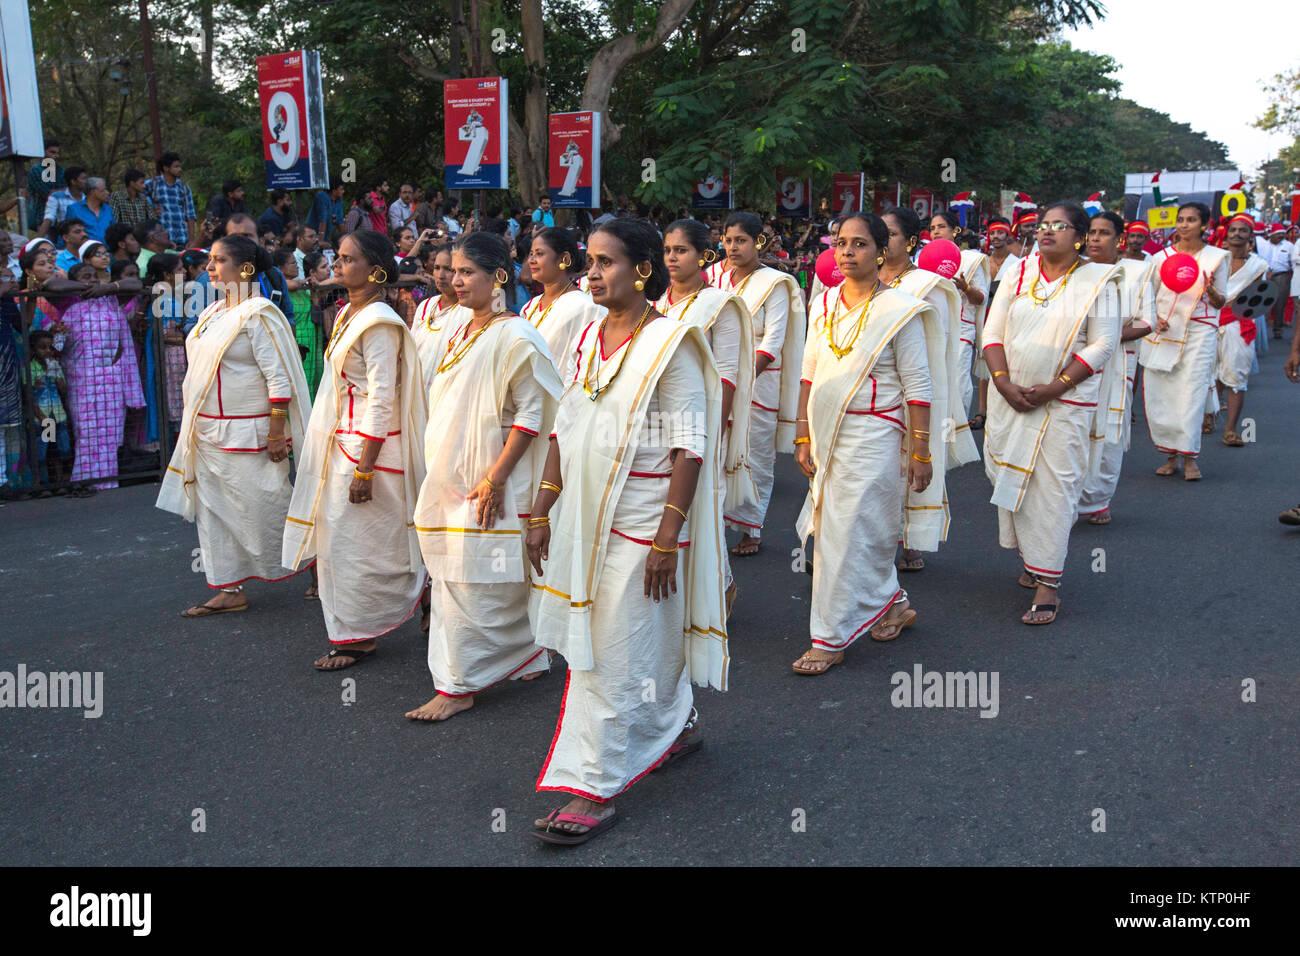 Buon Natale Thrissur.Thrissur Buon Natale Stock Photos Thrissur Buon Natale Stock